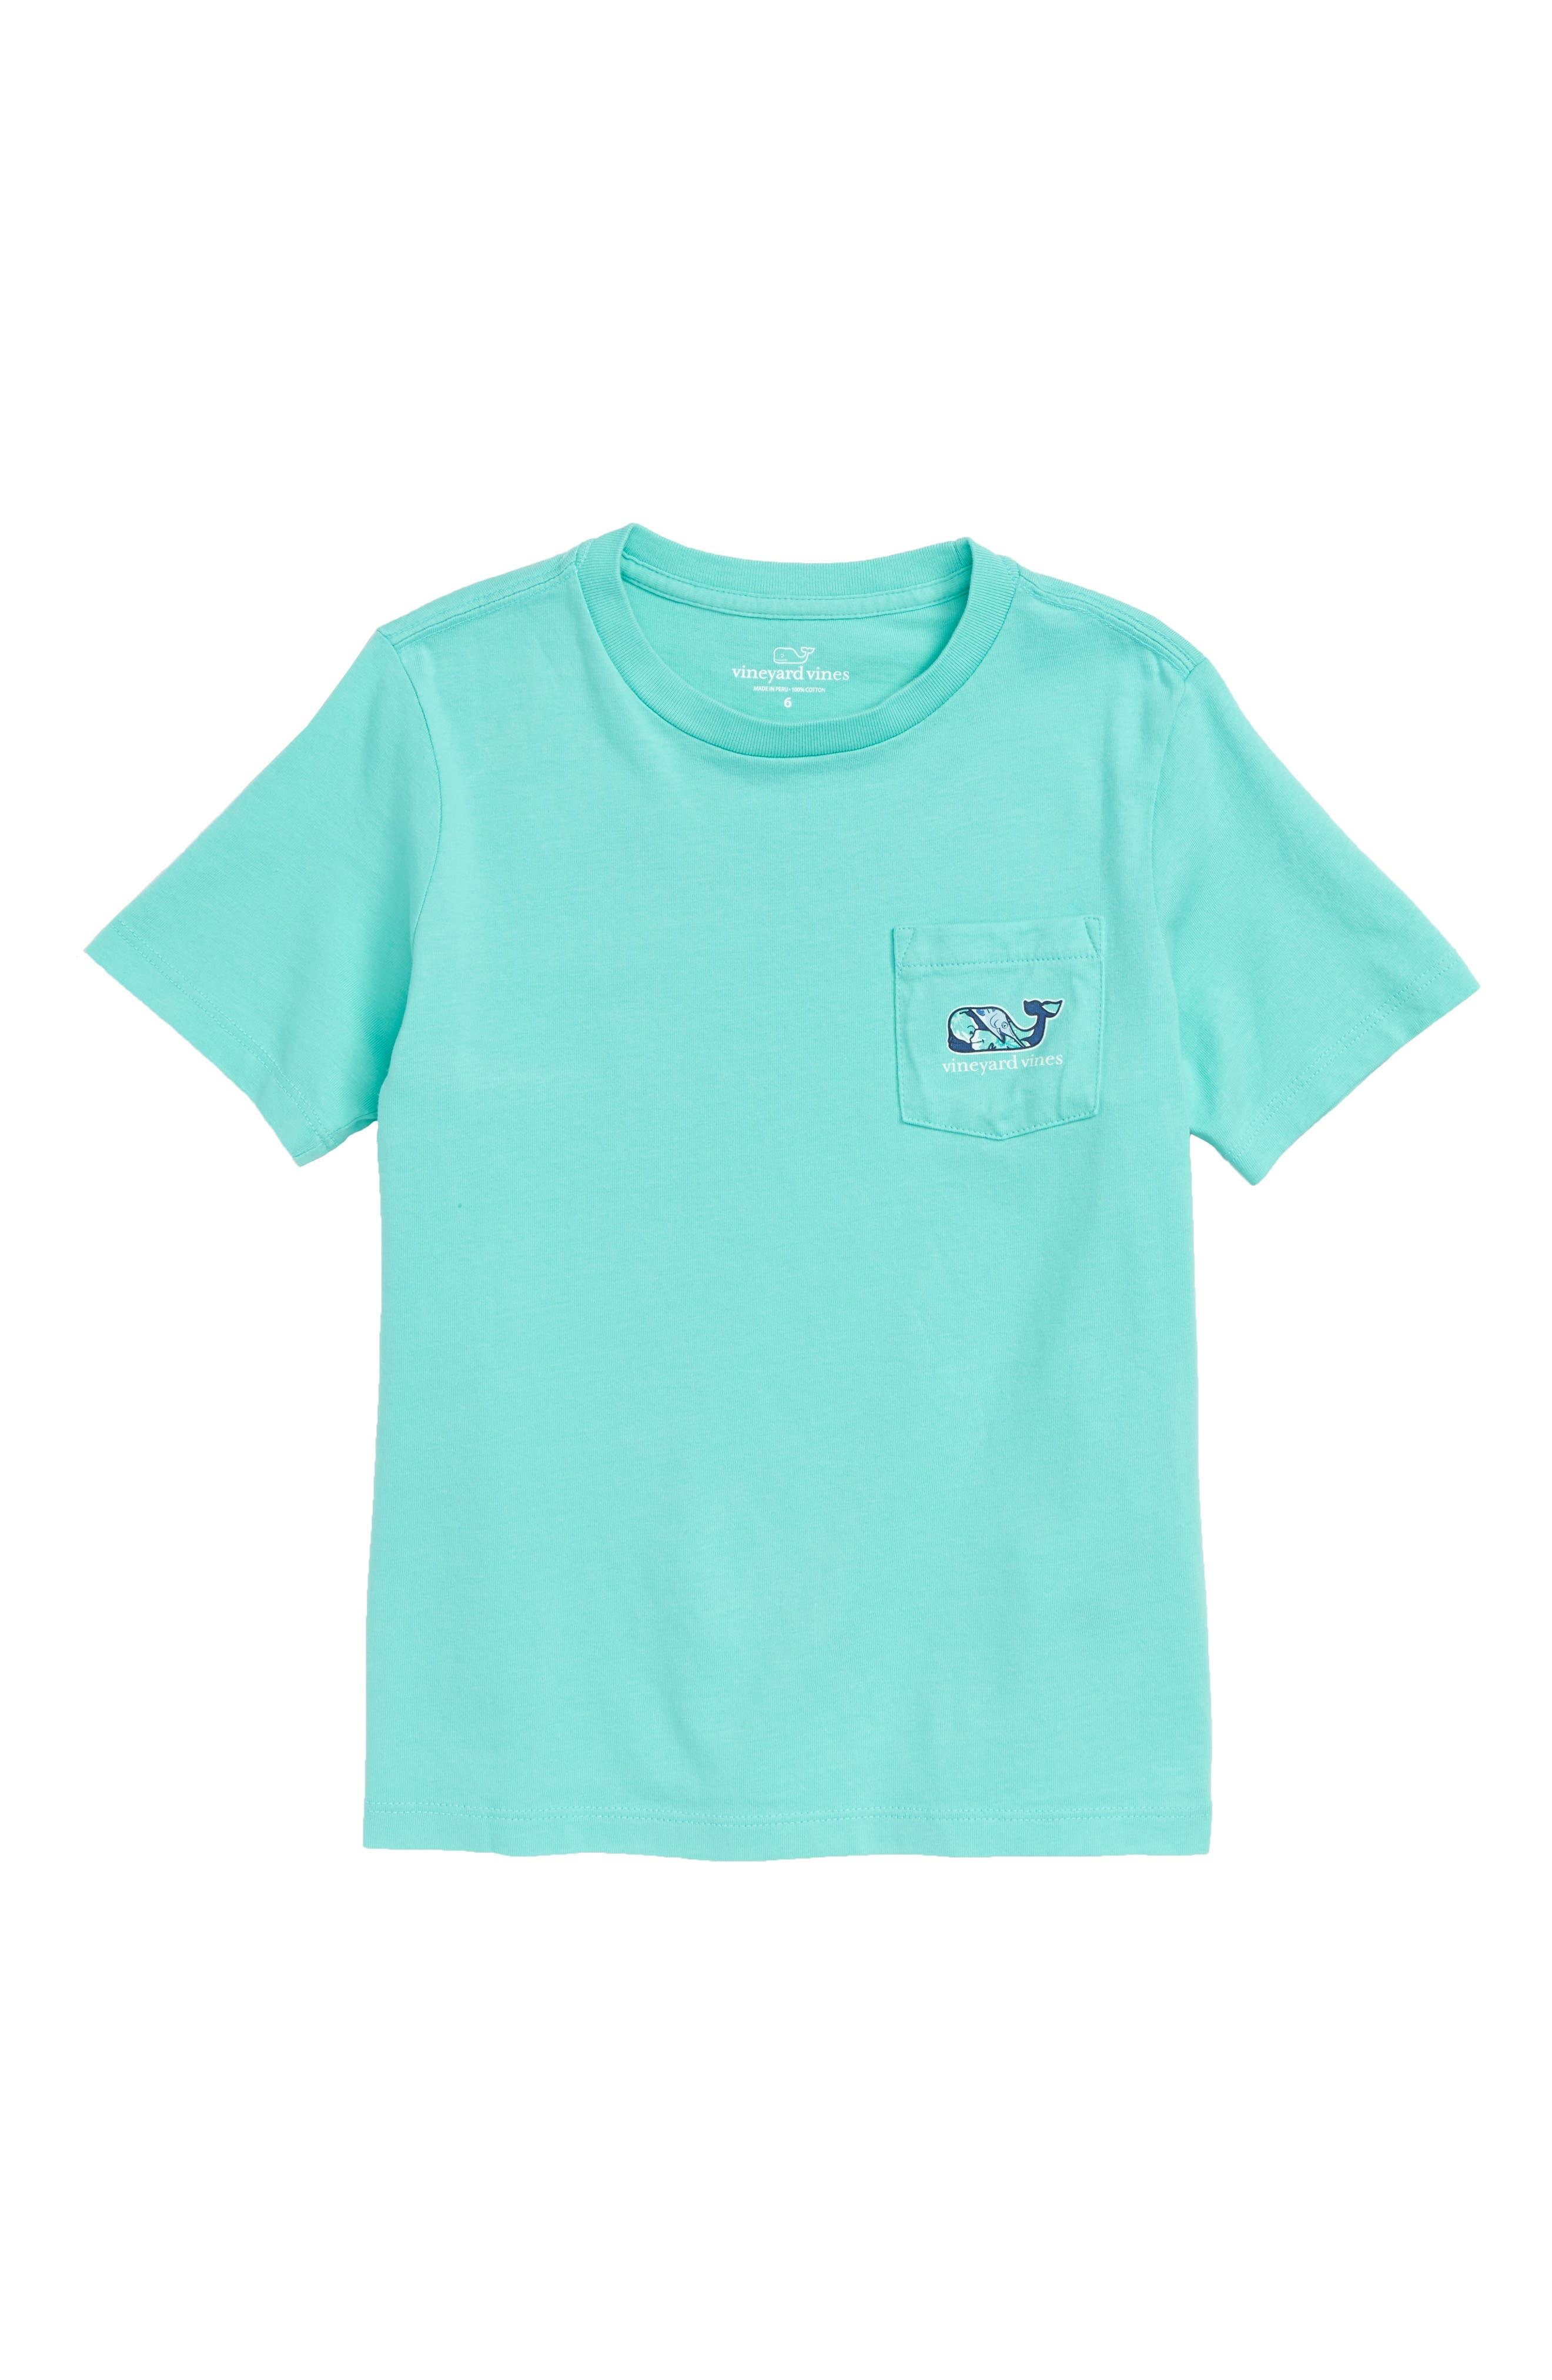 Marlin Flowers Whale Pocket T-Shirt,                             Main thumbnail 1, color,                             CAPRI BLUE